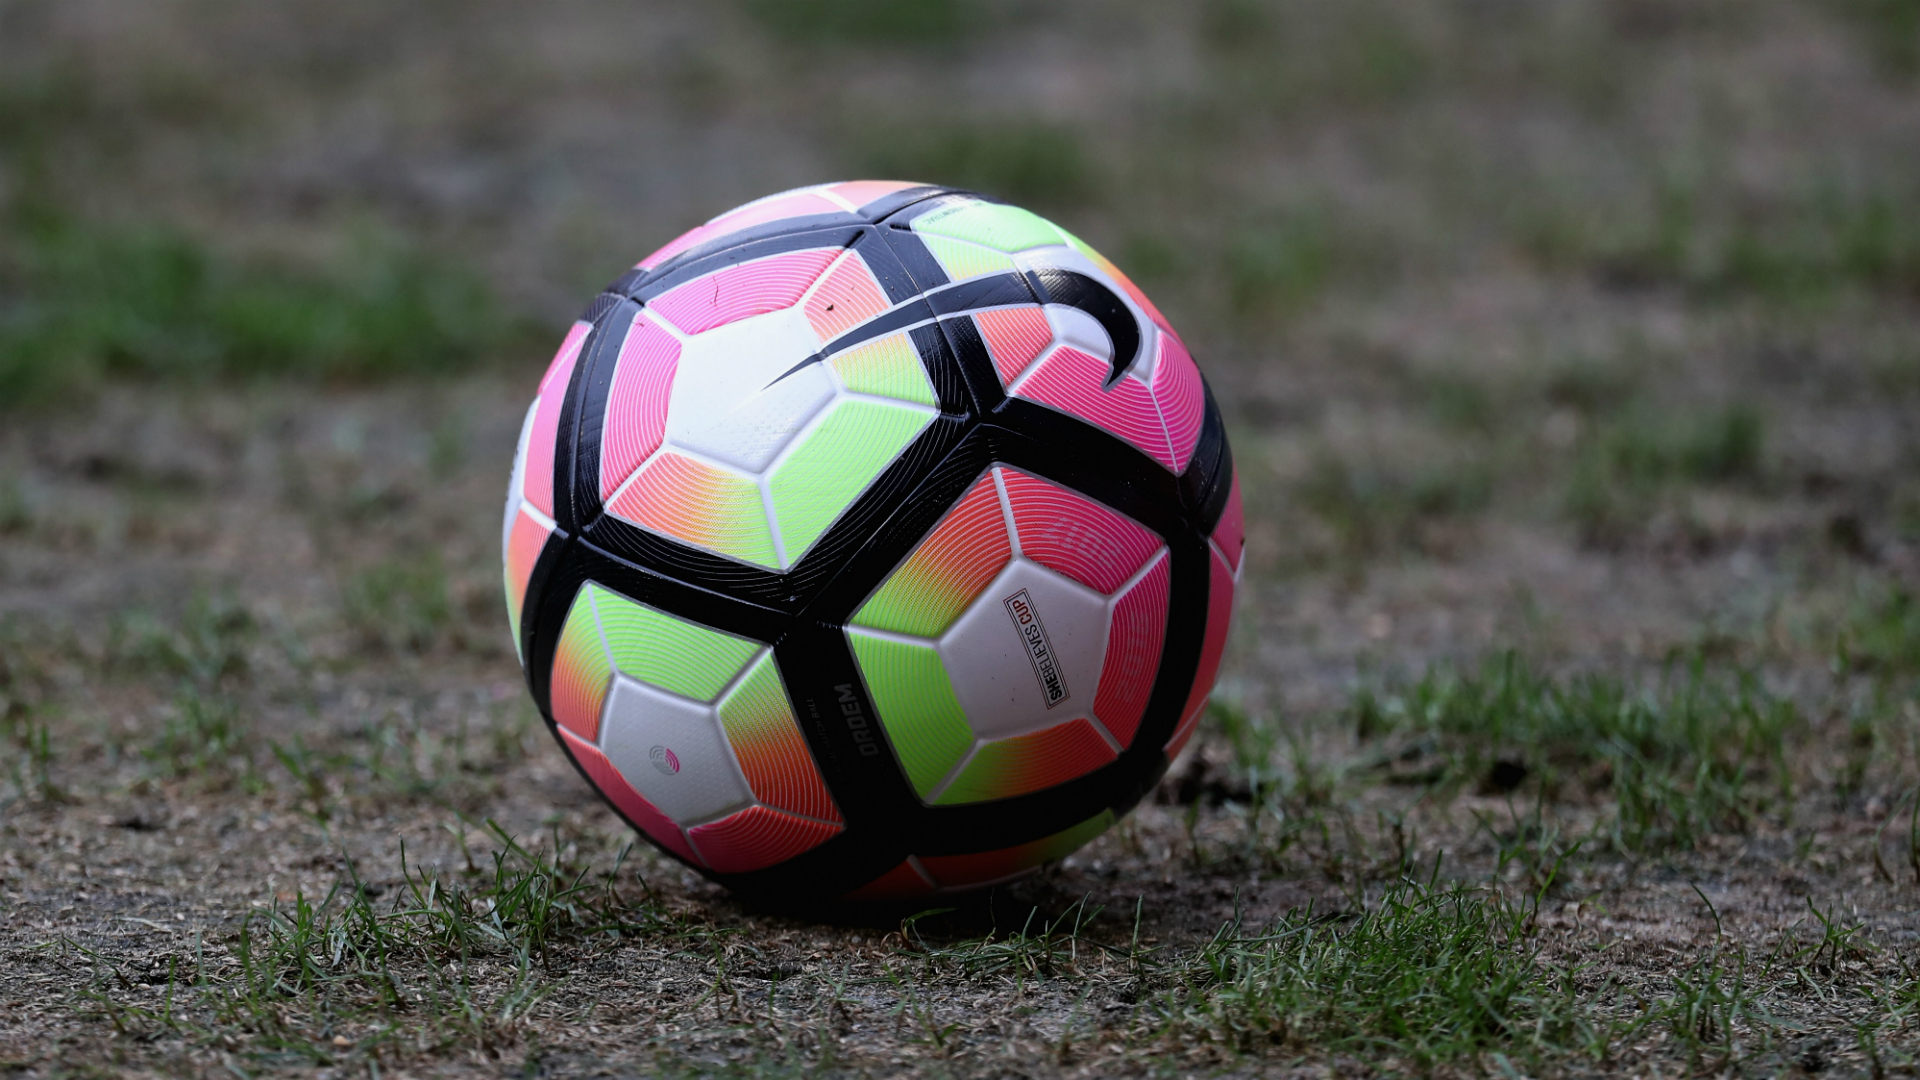 Testimony: Fox Sports involved in soccer bribes